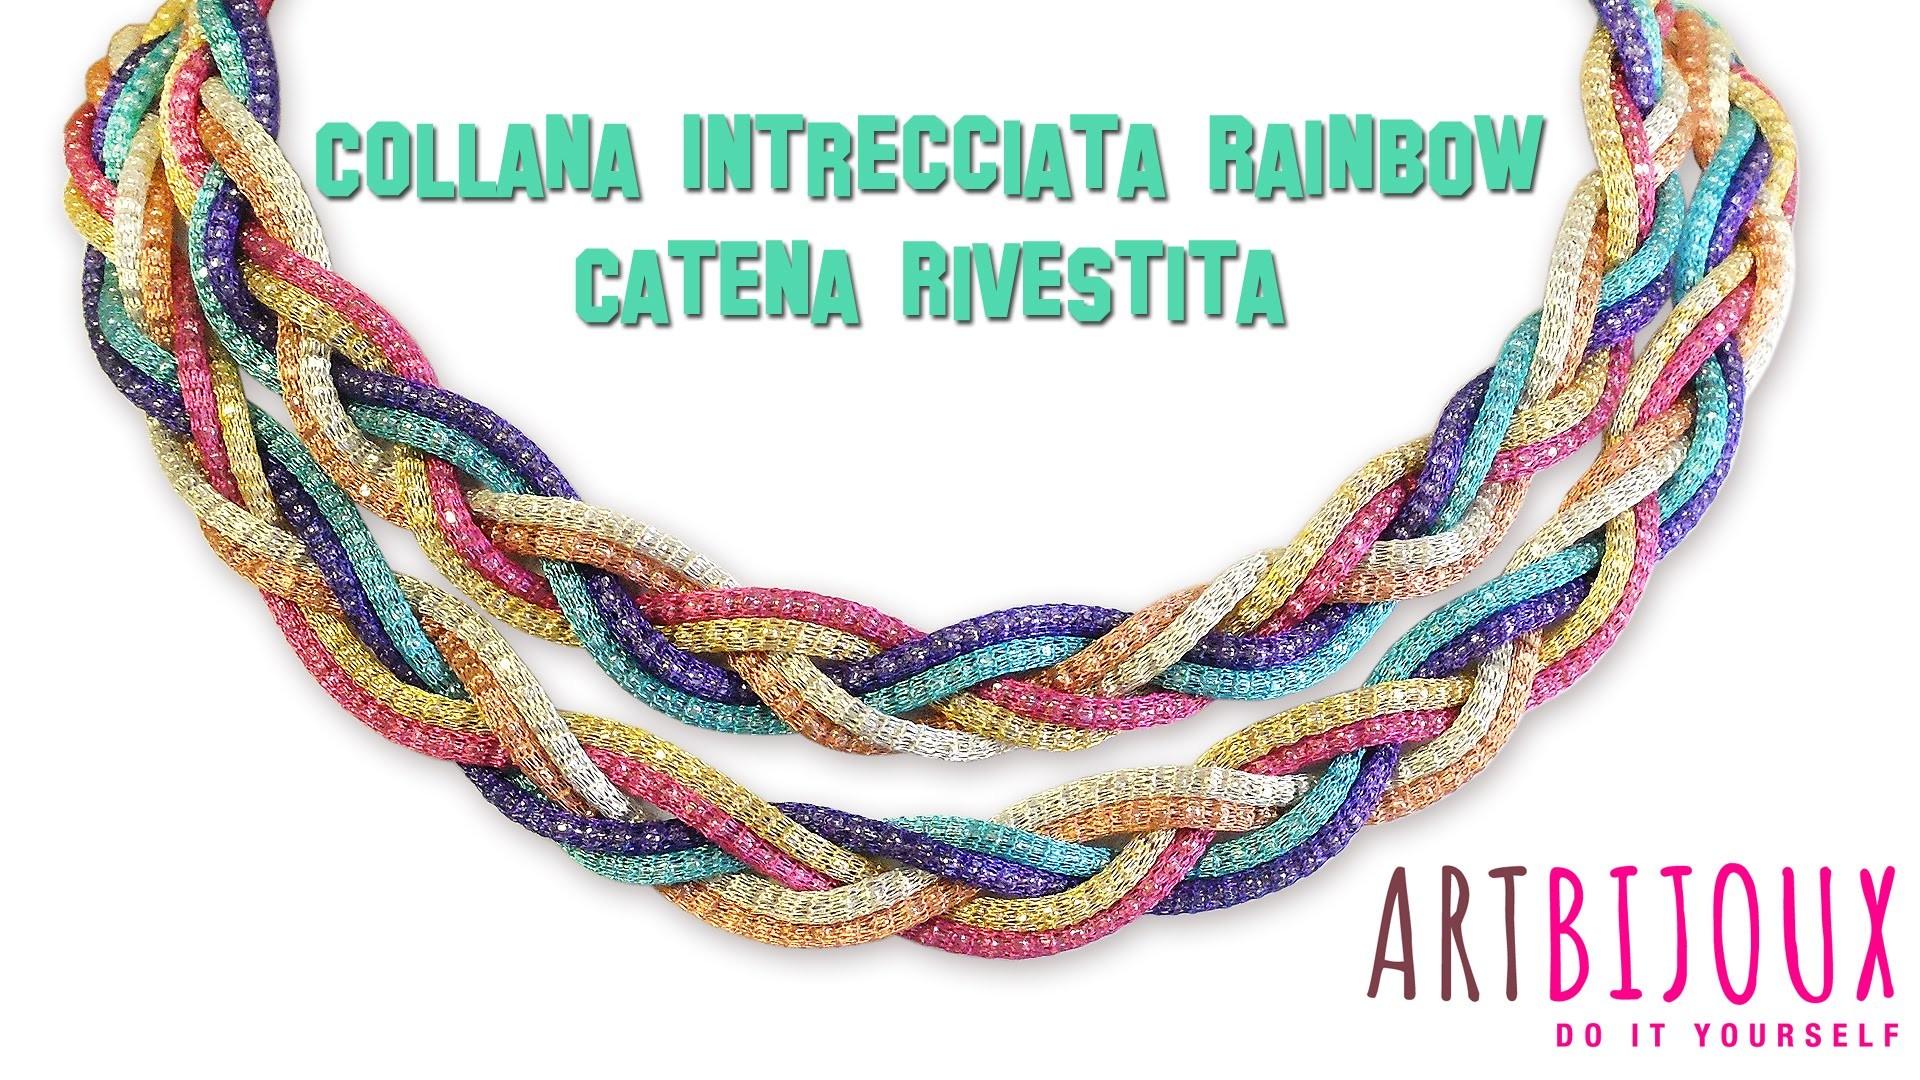 Collana Intrecciata Rainbow - Catena Rivestita - ArtBijoux